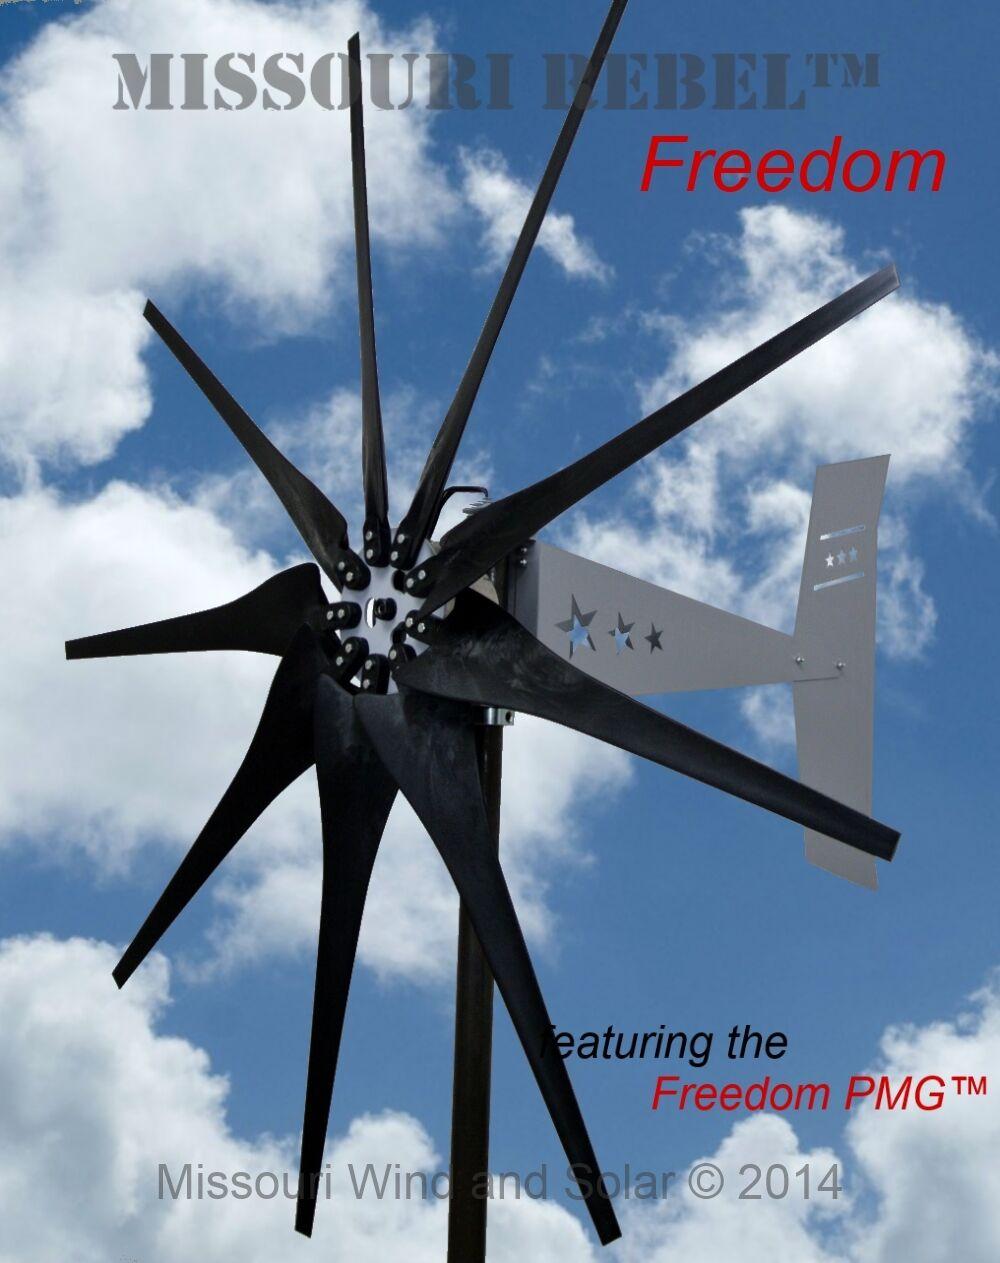 missouri rebel freiheit 12 volt 1700 watt max 9 klinge wind turbine generator ebay. Black Bedroom Furniture Sets. Home Design Ideas